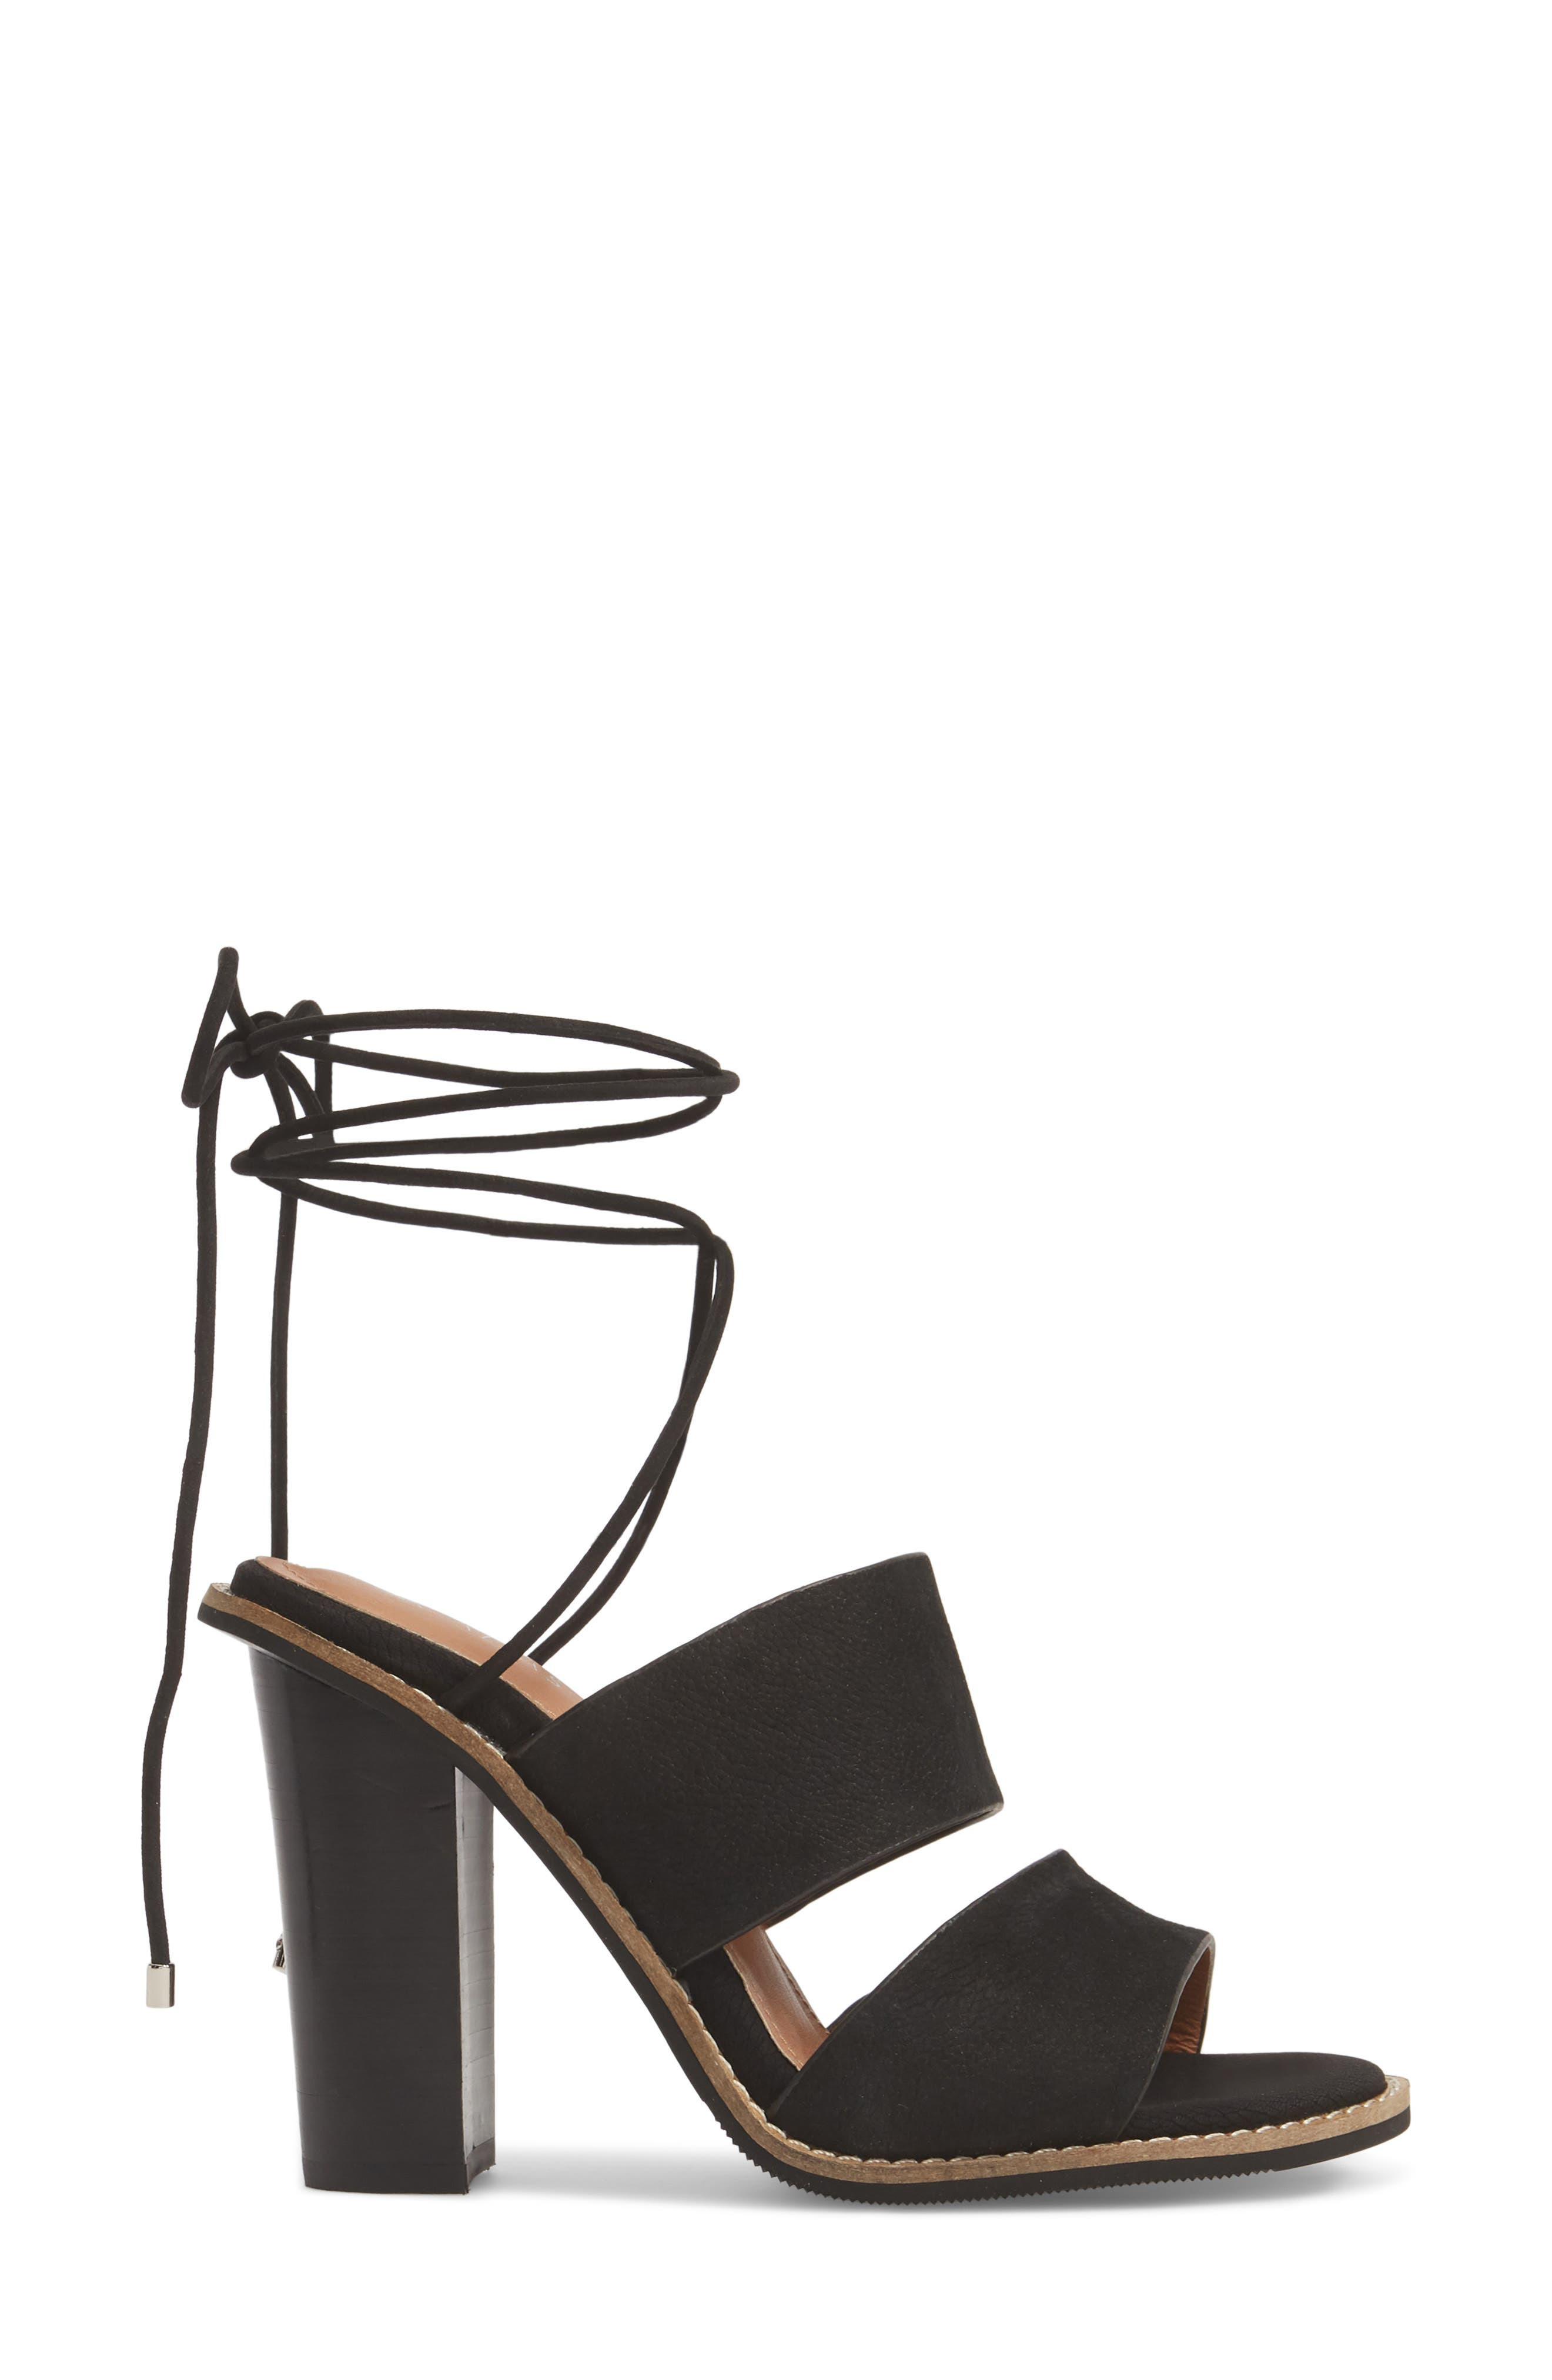 Cabrilla Sandal,                             Alternate thumbnail 3, color,                             Black Leather